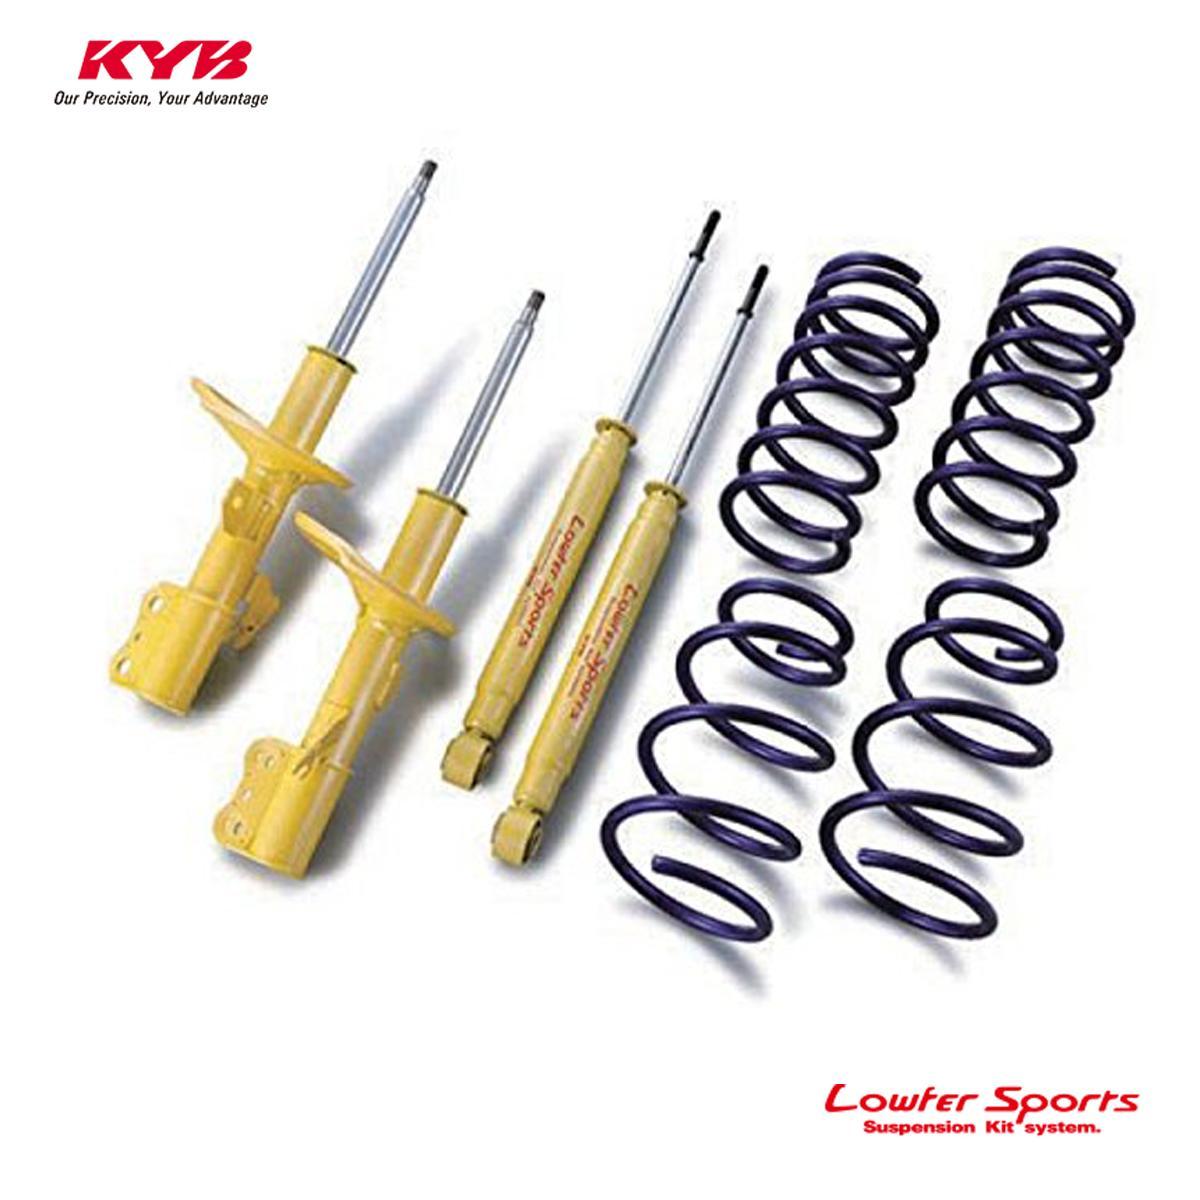 KYB カヤバ ワゴンR MC22S ショックアブソーバー サスペンションキット Lowfer Sports LKIT-MC21S 配送先条件有り